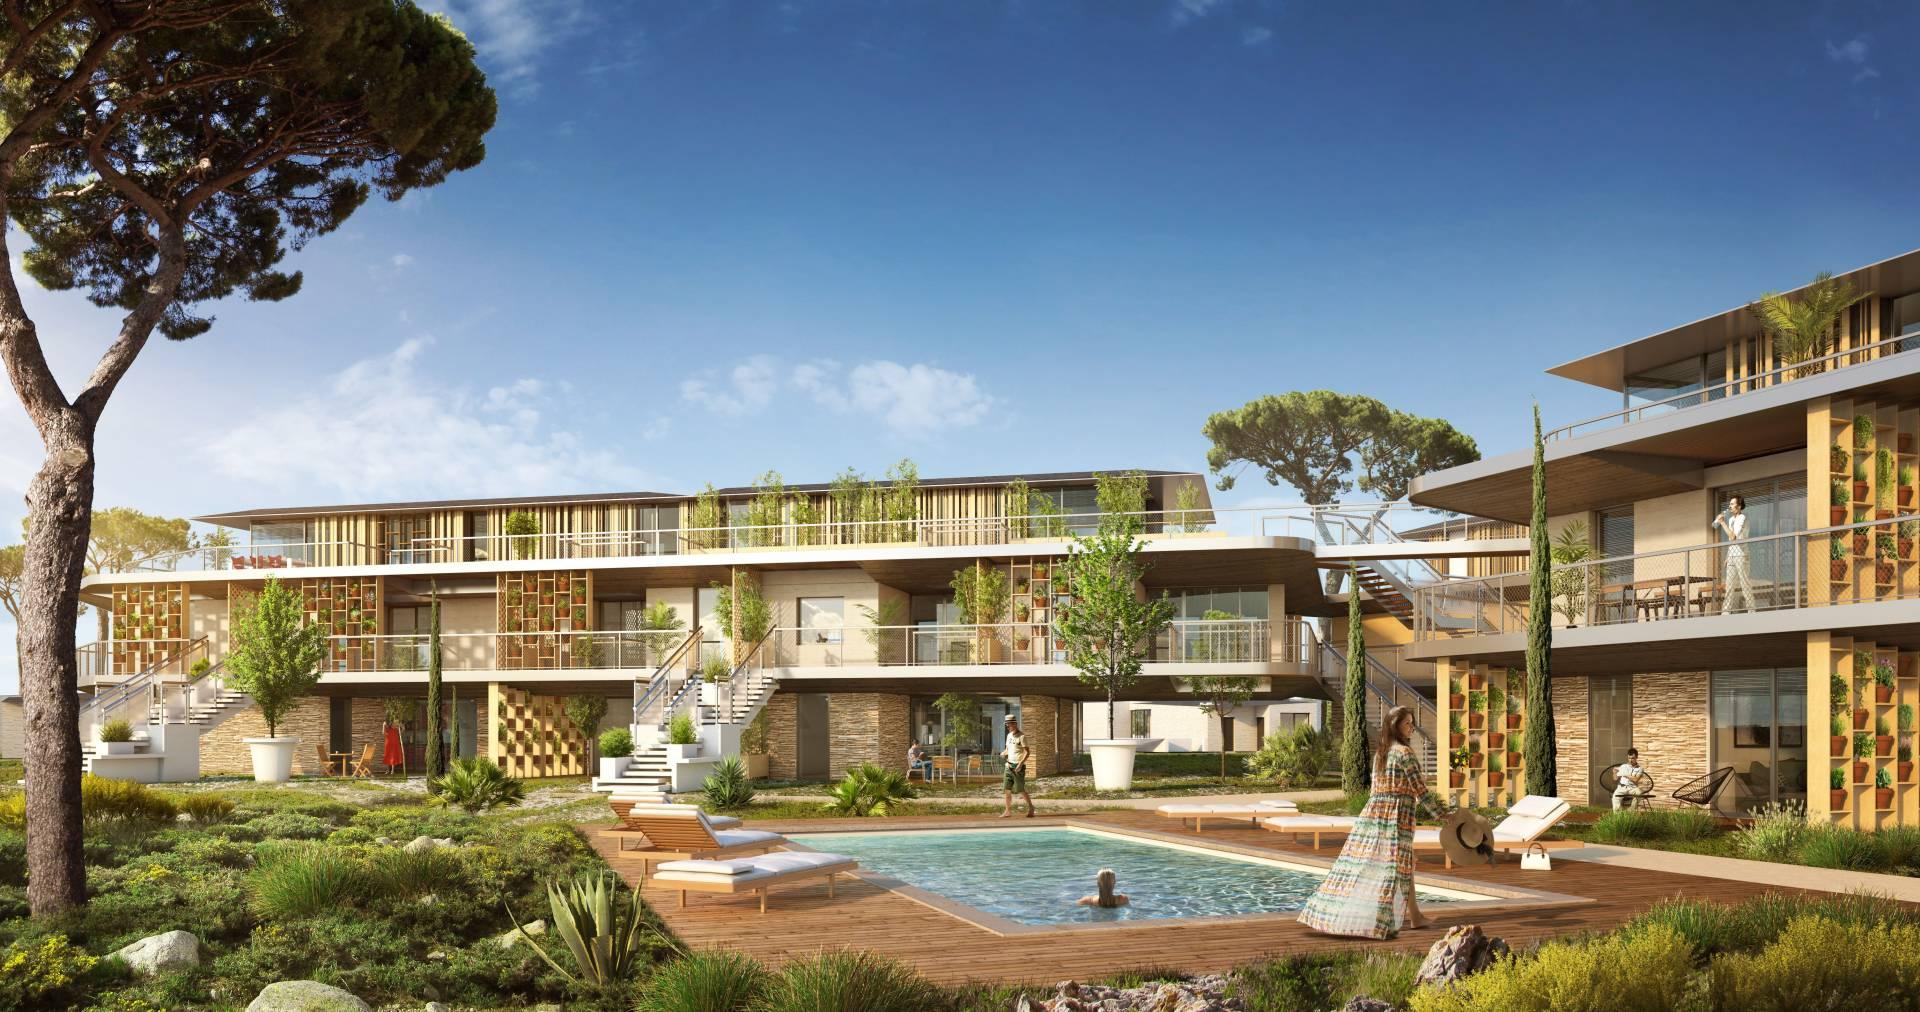 Investissez dans le neuf à Lecci Sud Corse avec le programme Pinel Sognu di Cala Rossa